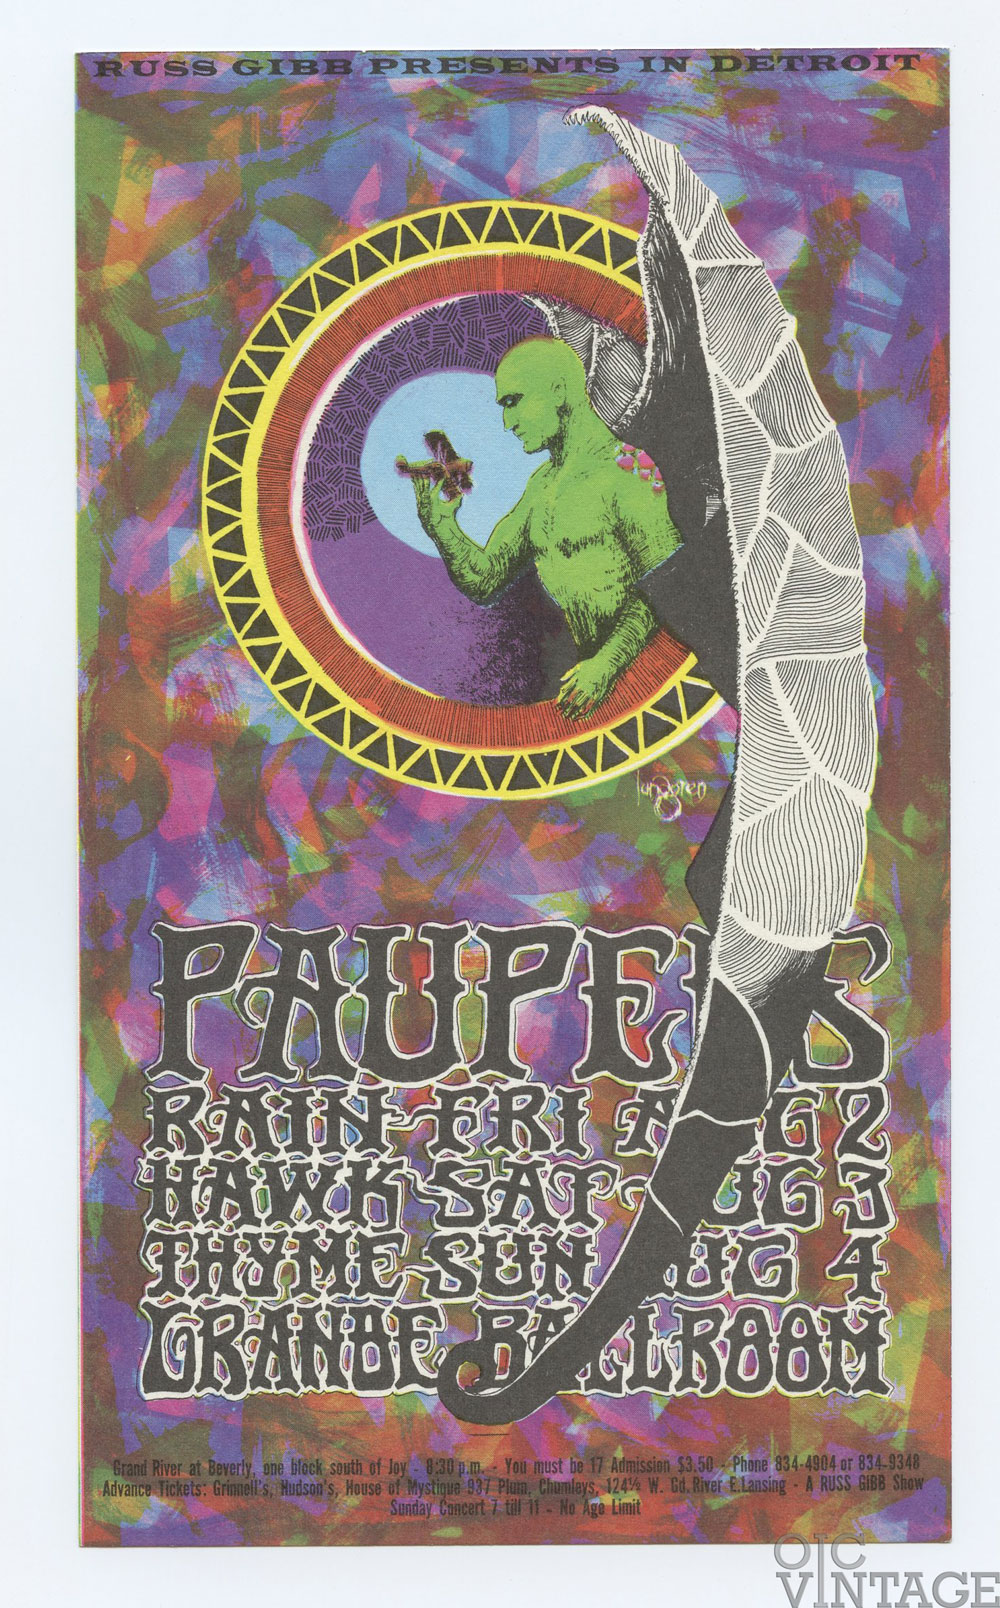 Grande Ballroom 1968 Aug 2 Postcard Paupers Rain Hawk Tyme